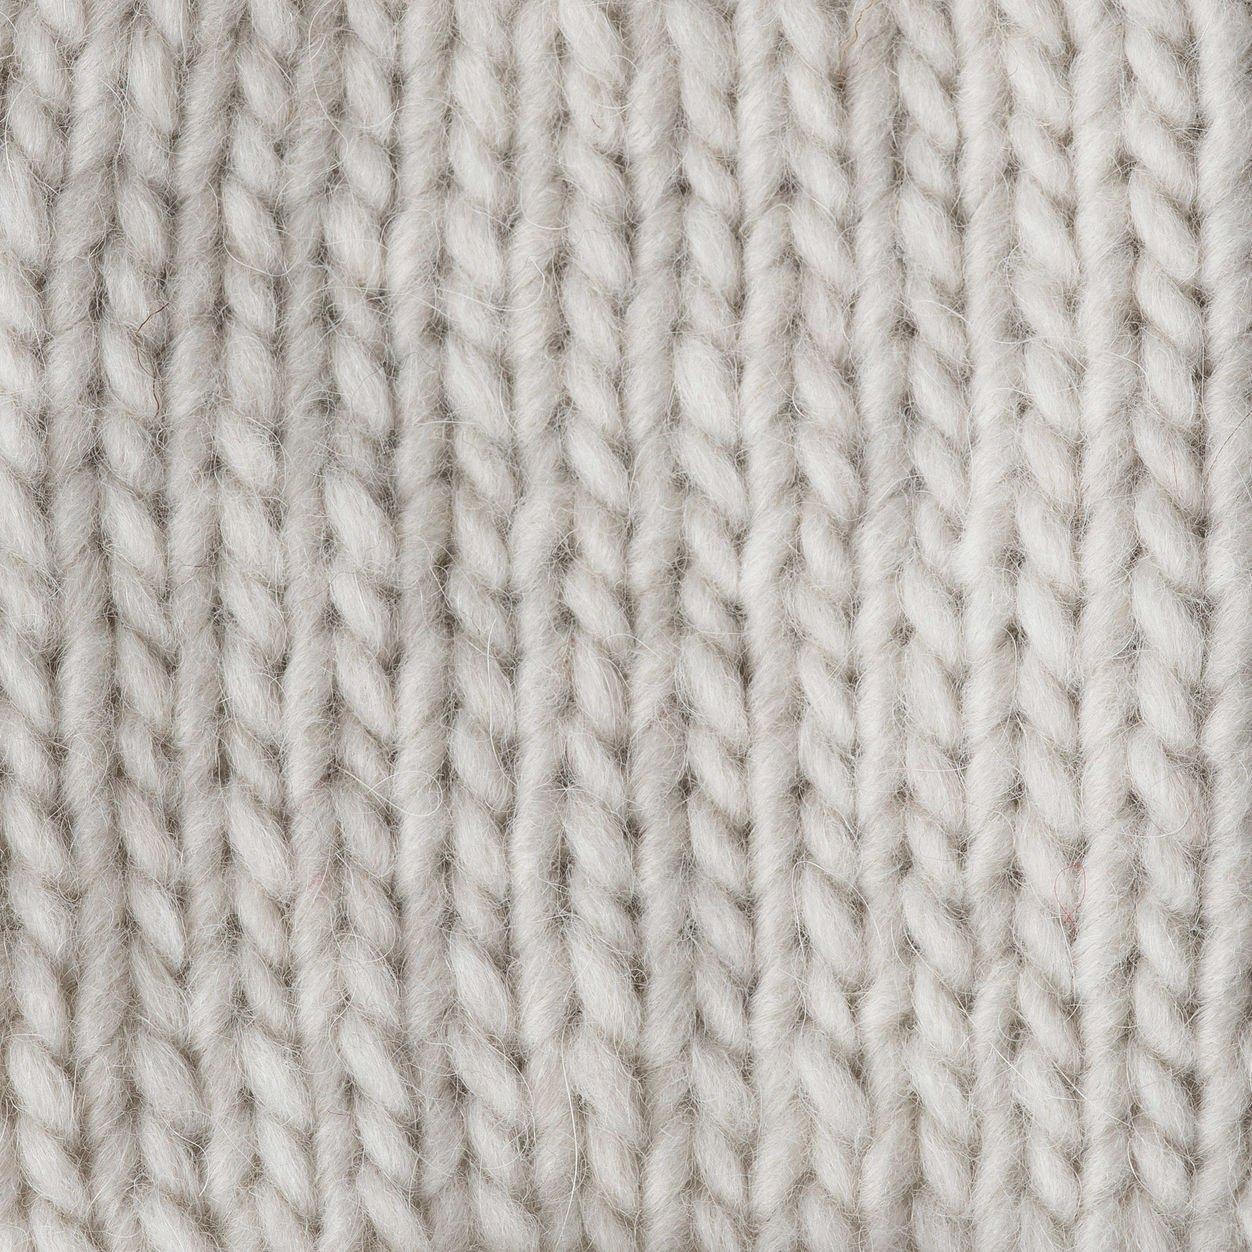 5 Patons Alpaca Blend Yarn- Bulky Gauge -3.5oz- Oats- Machine Washable for Crochet Knitting /& Crafting